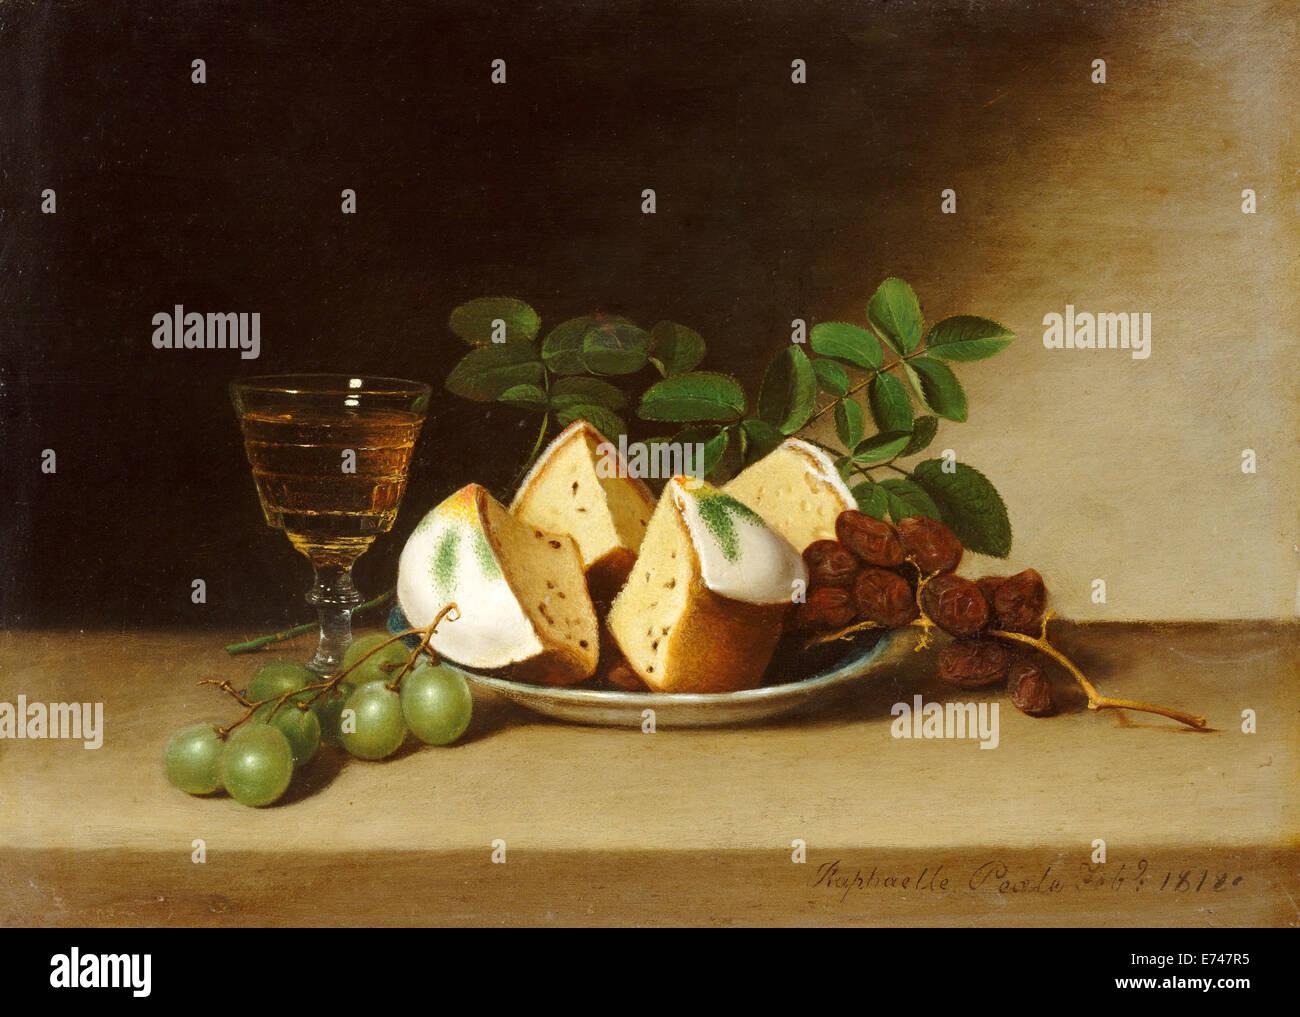 Still Life with Cake - par Raphaelle Peale, 1818 Photo Stock